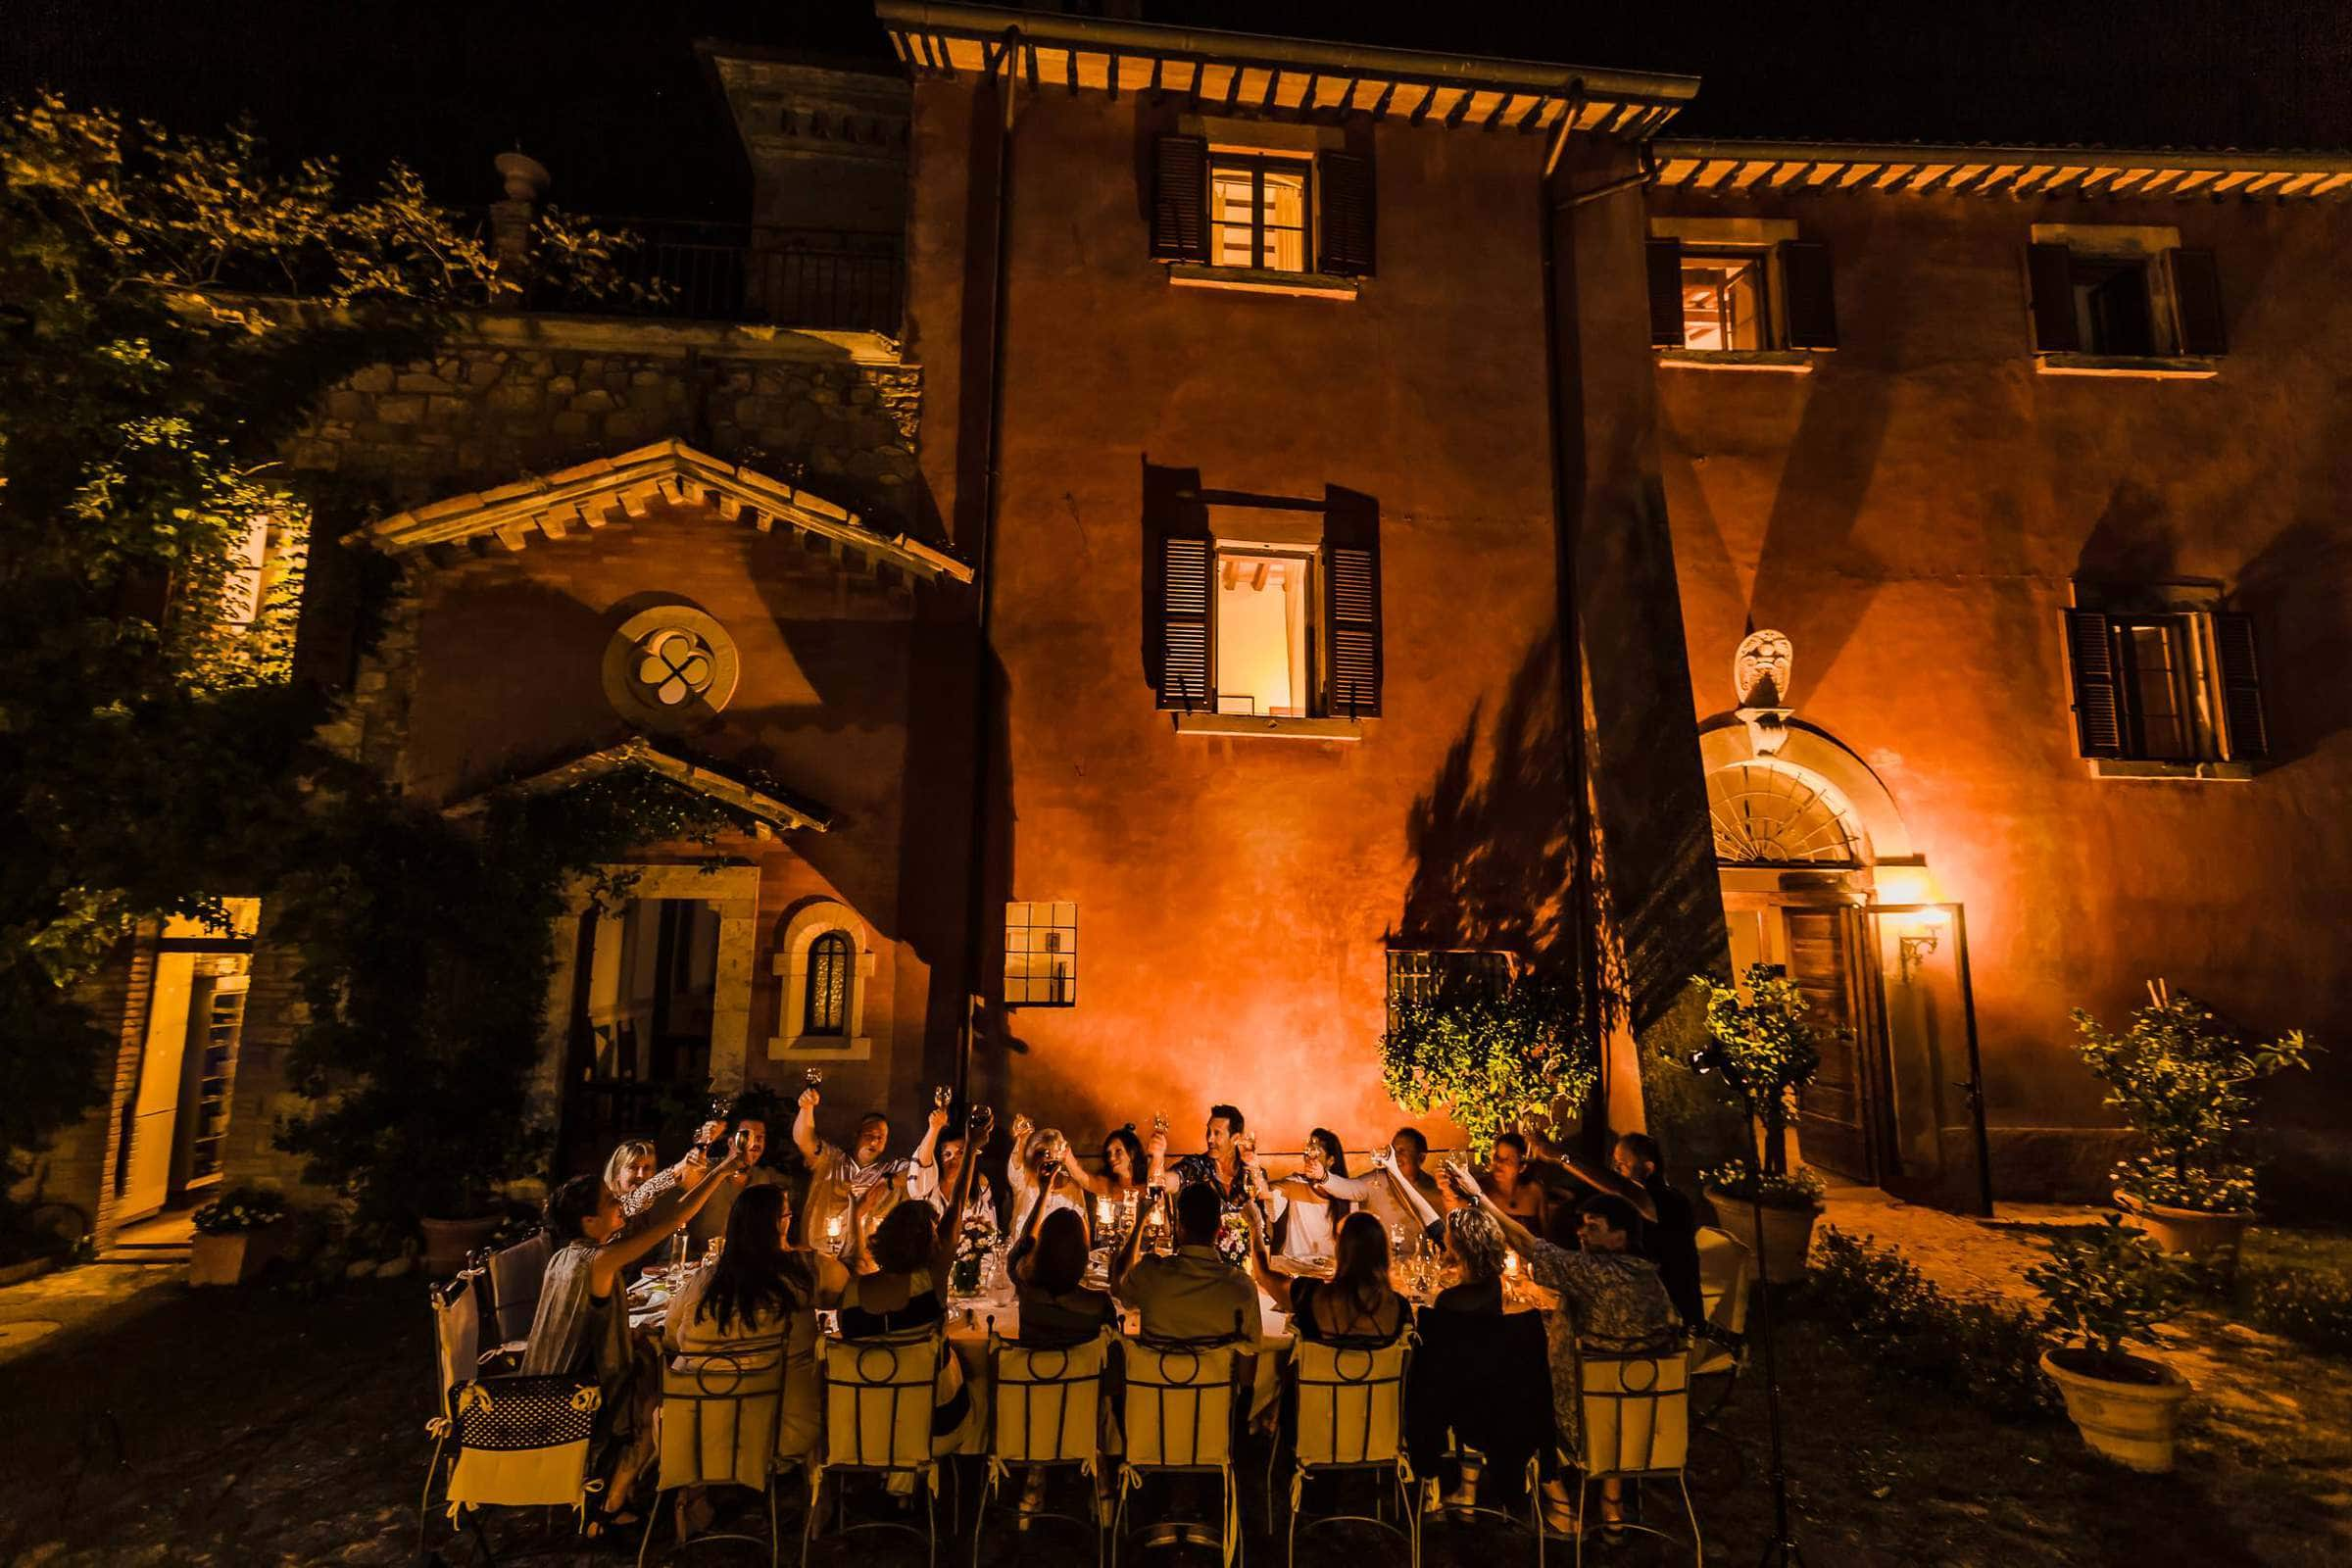 Guests enjoying a reception dinner during a Villa Tre Grazie wedding celebration near Todi, Italy.